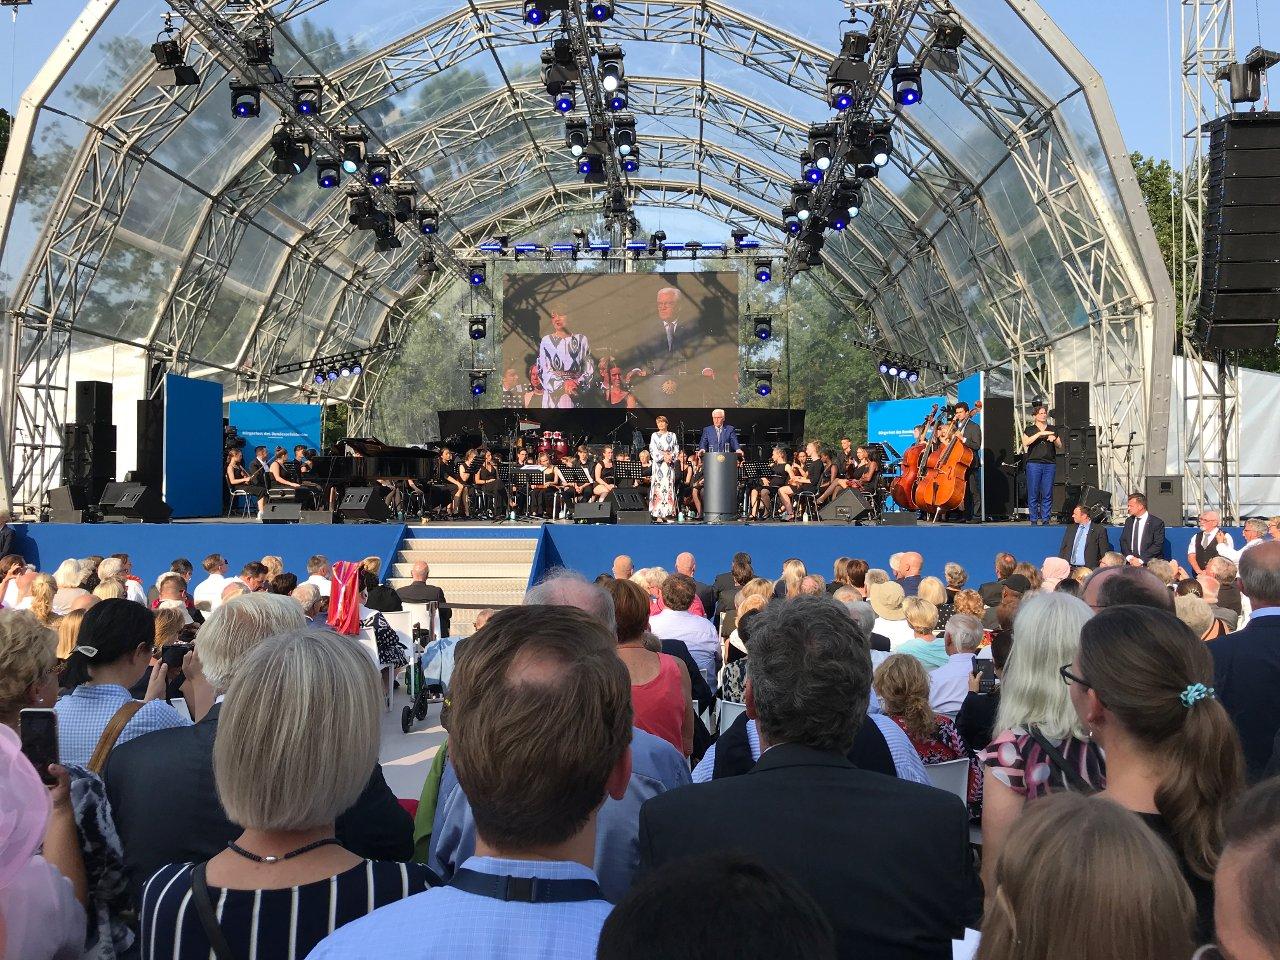 Foto: Bundespräsident Frank-Walter Steinmeier und Frau Elke Büdenbender begrüßen die Gäste des Bürgerfests 2019 (Foto: Jörg Meyer | jumpr.com)